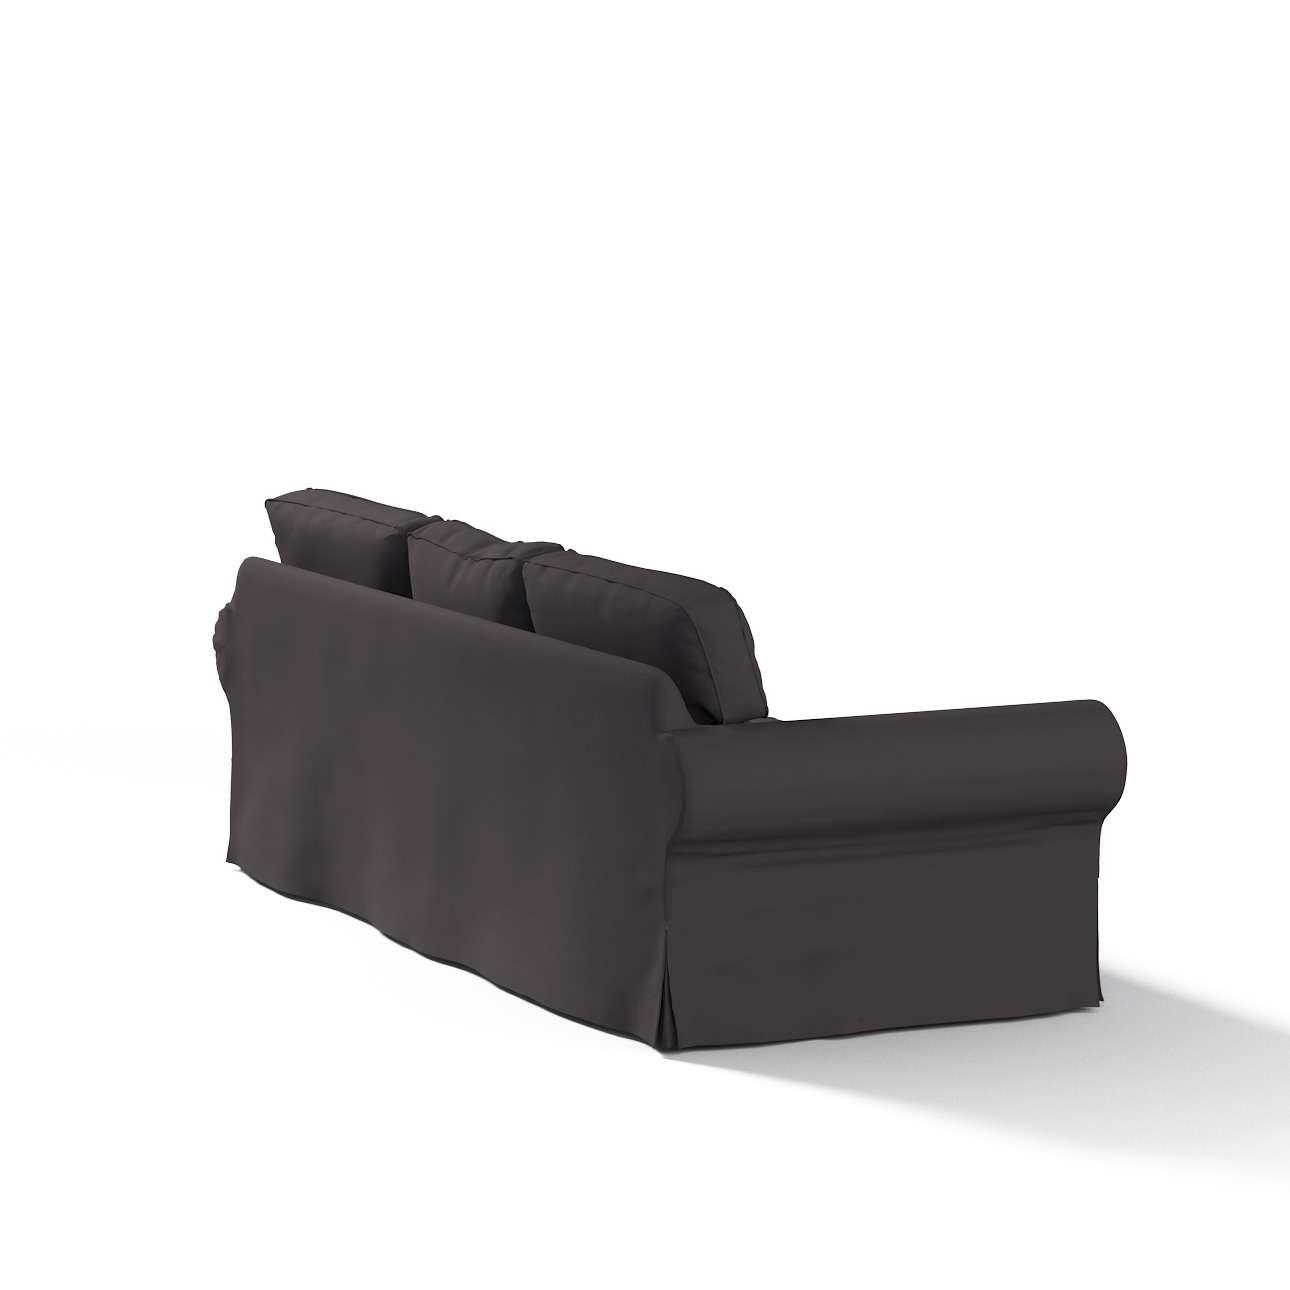 Ektorp 3-Sitzer Sofabezug nicht ausklappbar Sofabezug für  Ektorp 3-Sitzer nicht ausklappbar von der Kollektion Cotton Panama, Stoff: 702-09